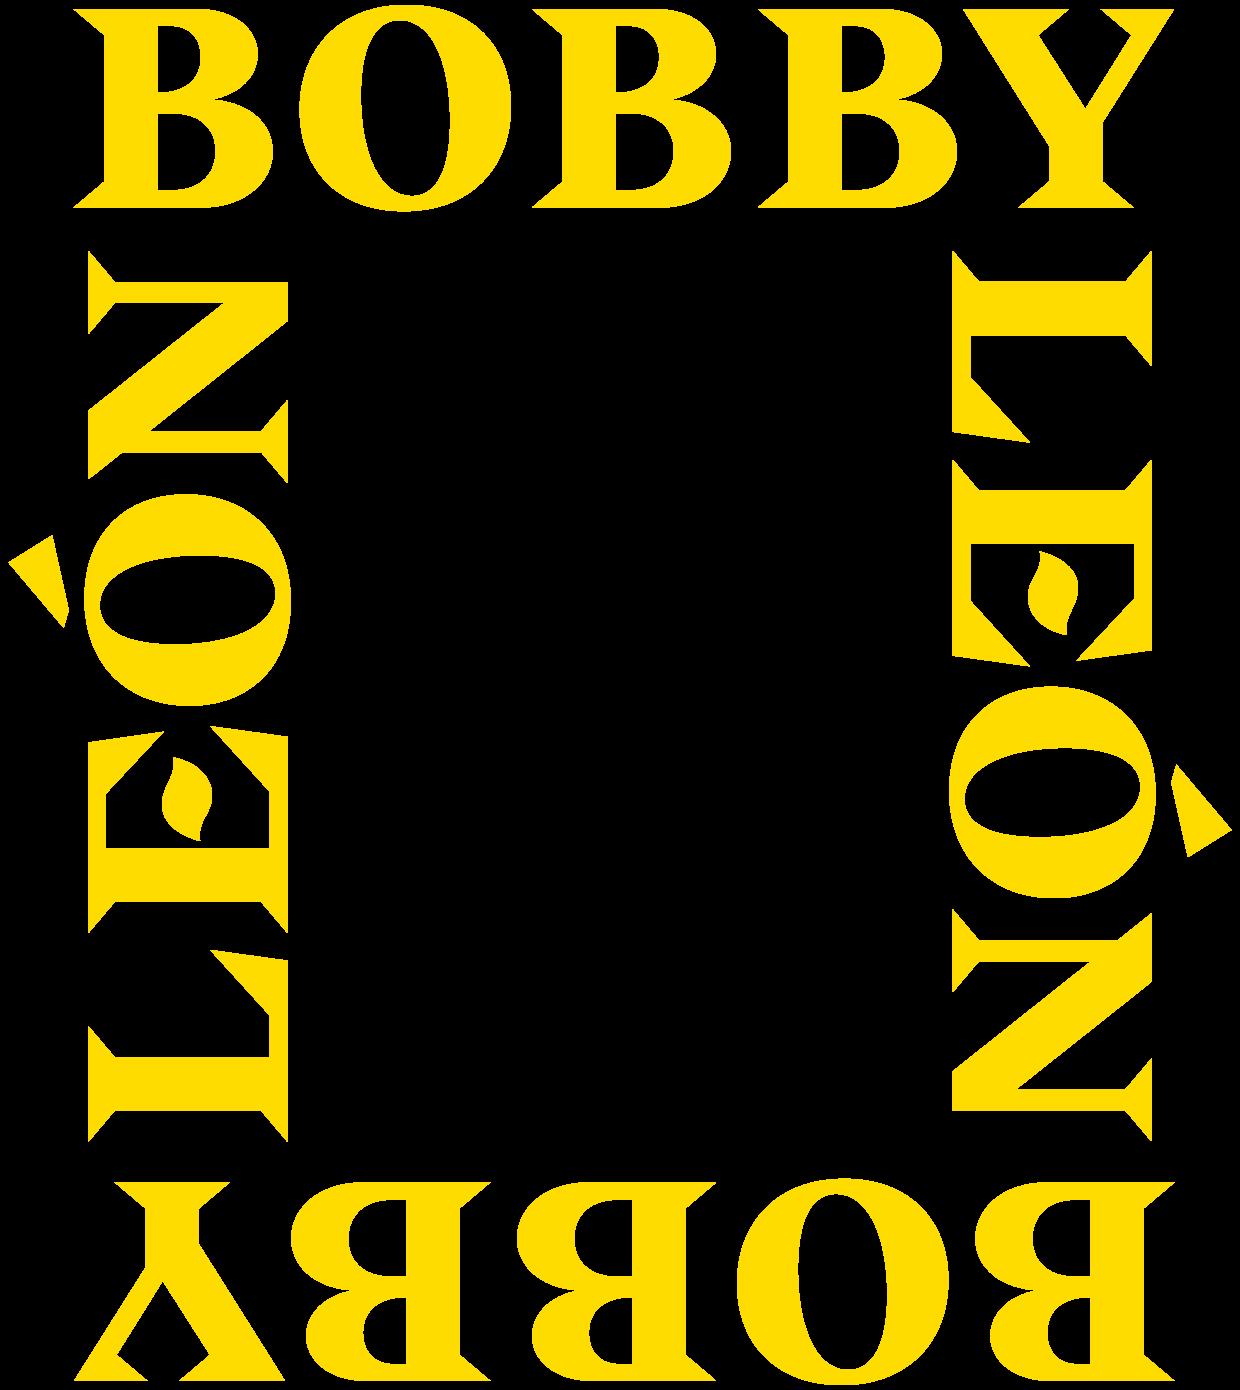 Bobby León